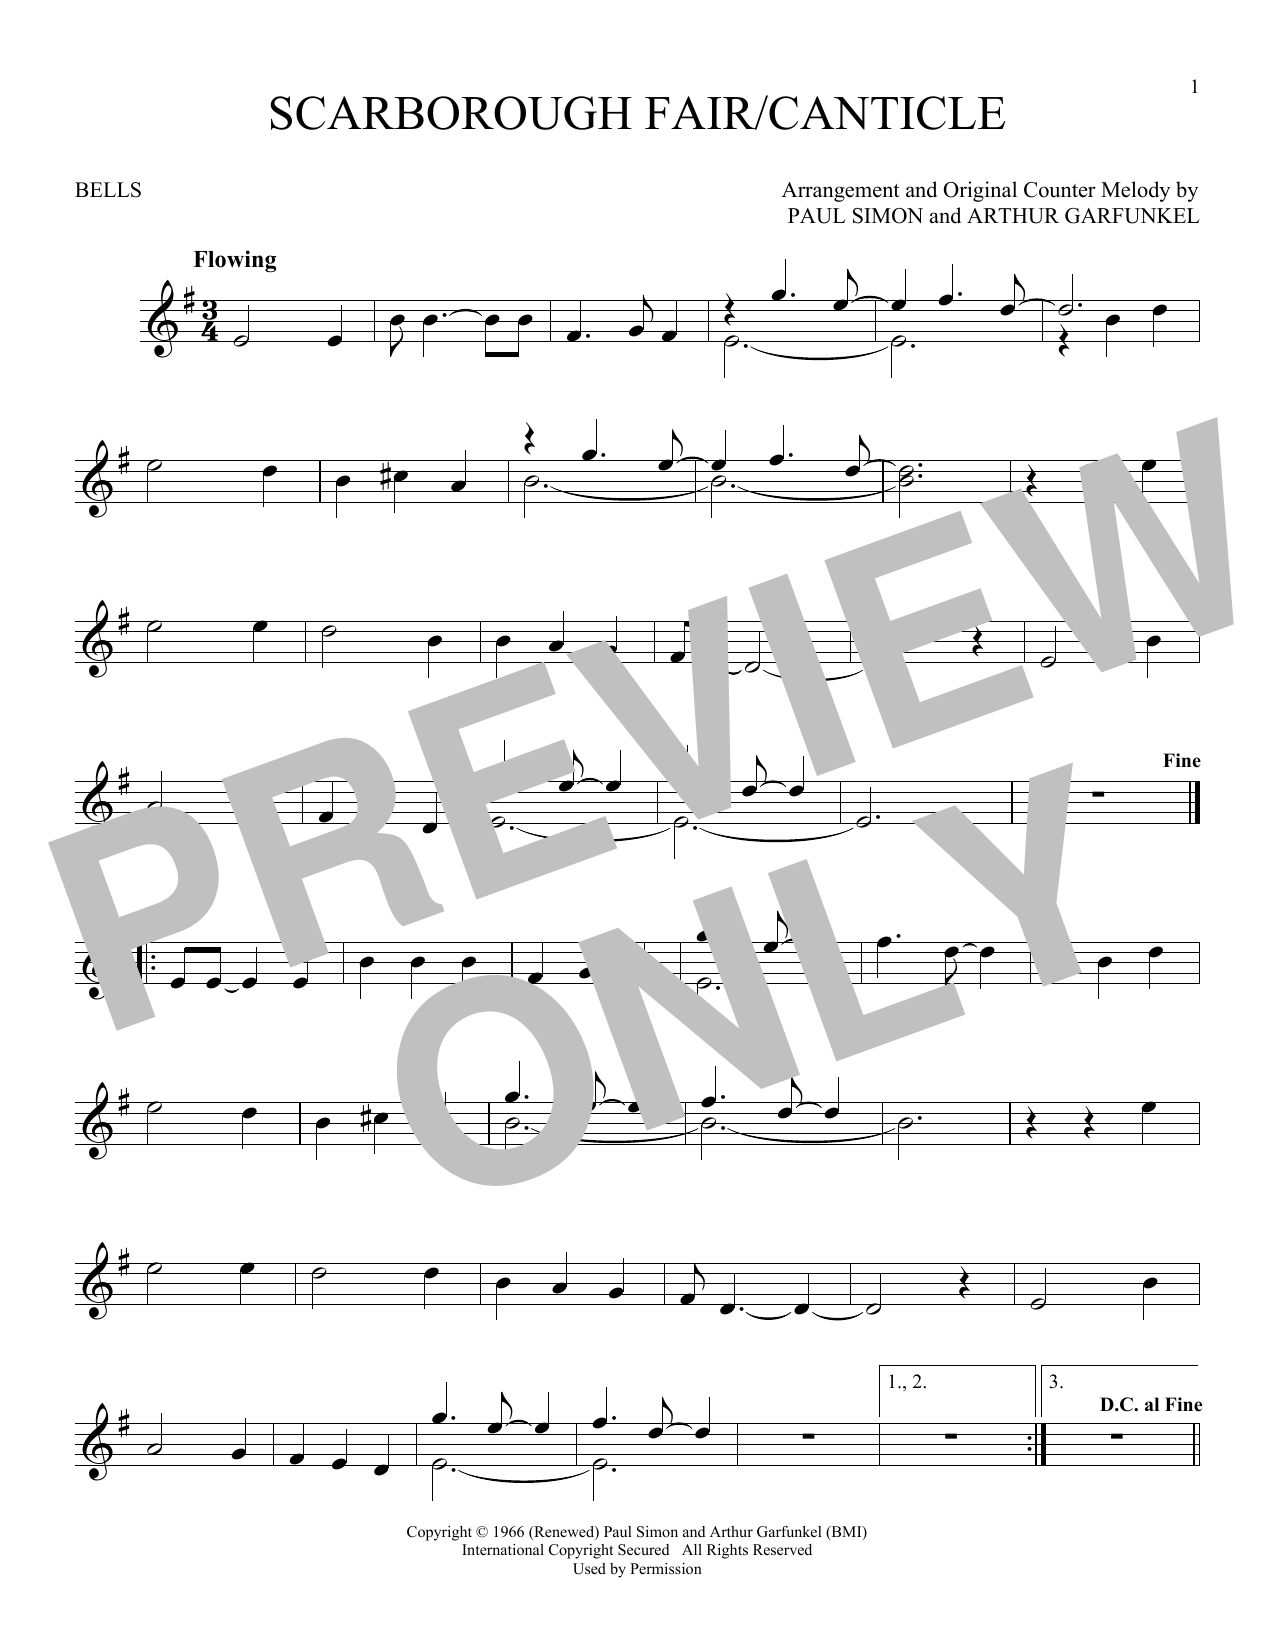 Scarborough Fair/Canticle (Bells Solo)